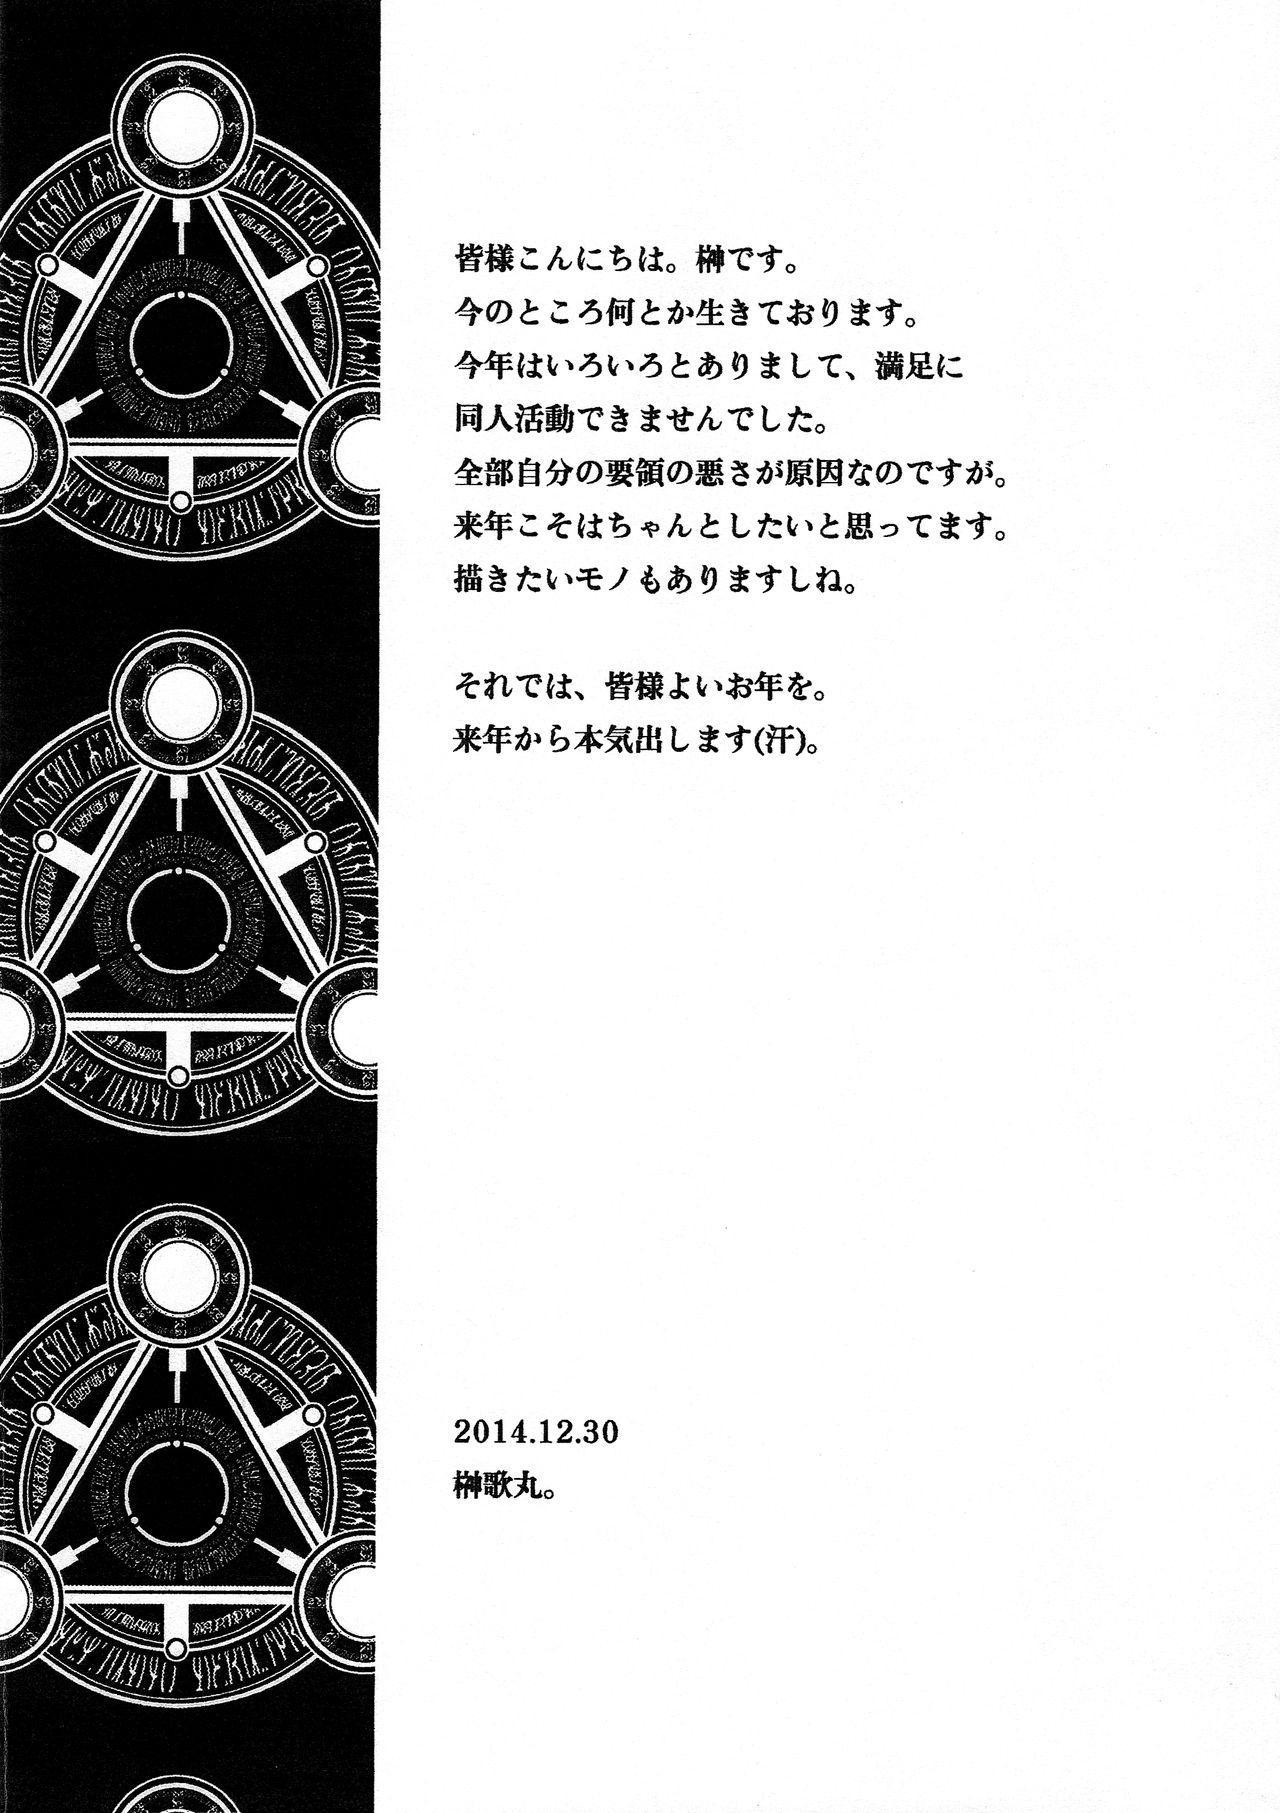 Breakin' Rakugakichou 2014 5